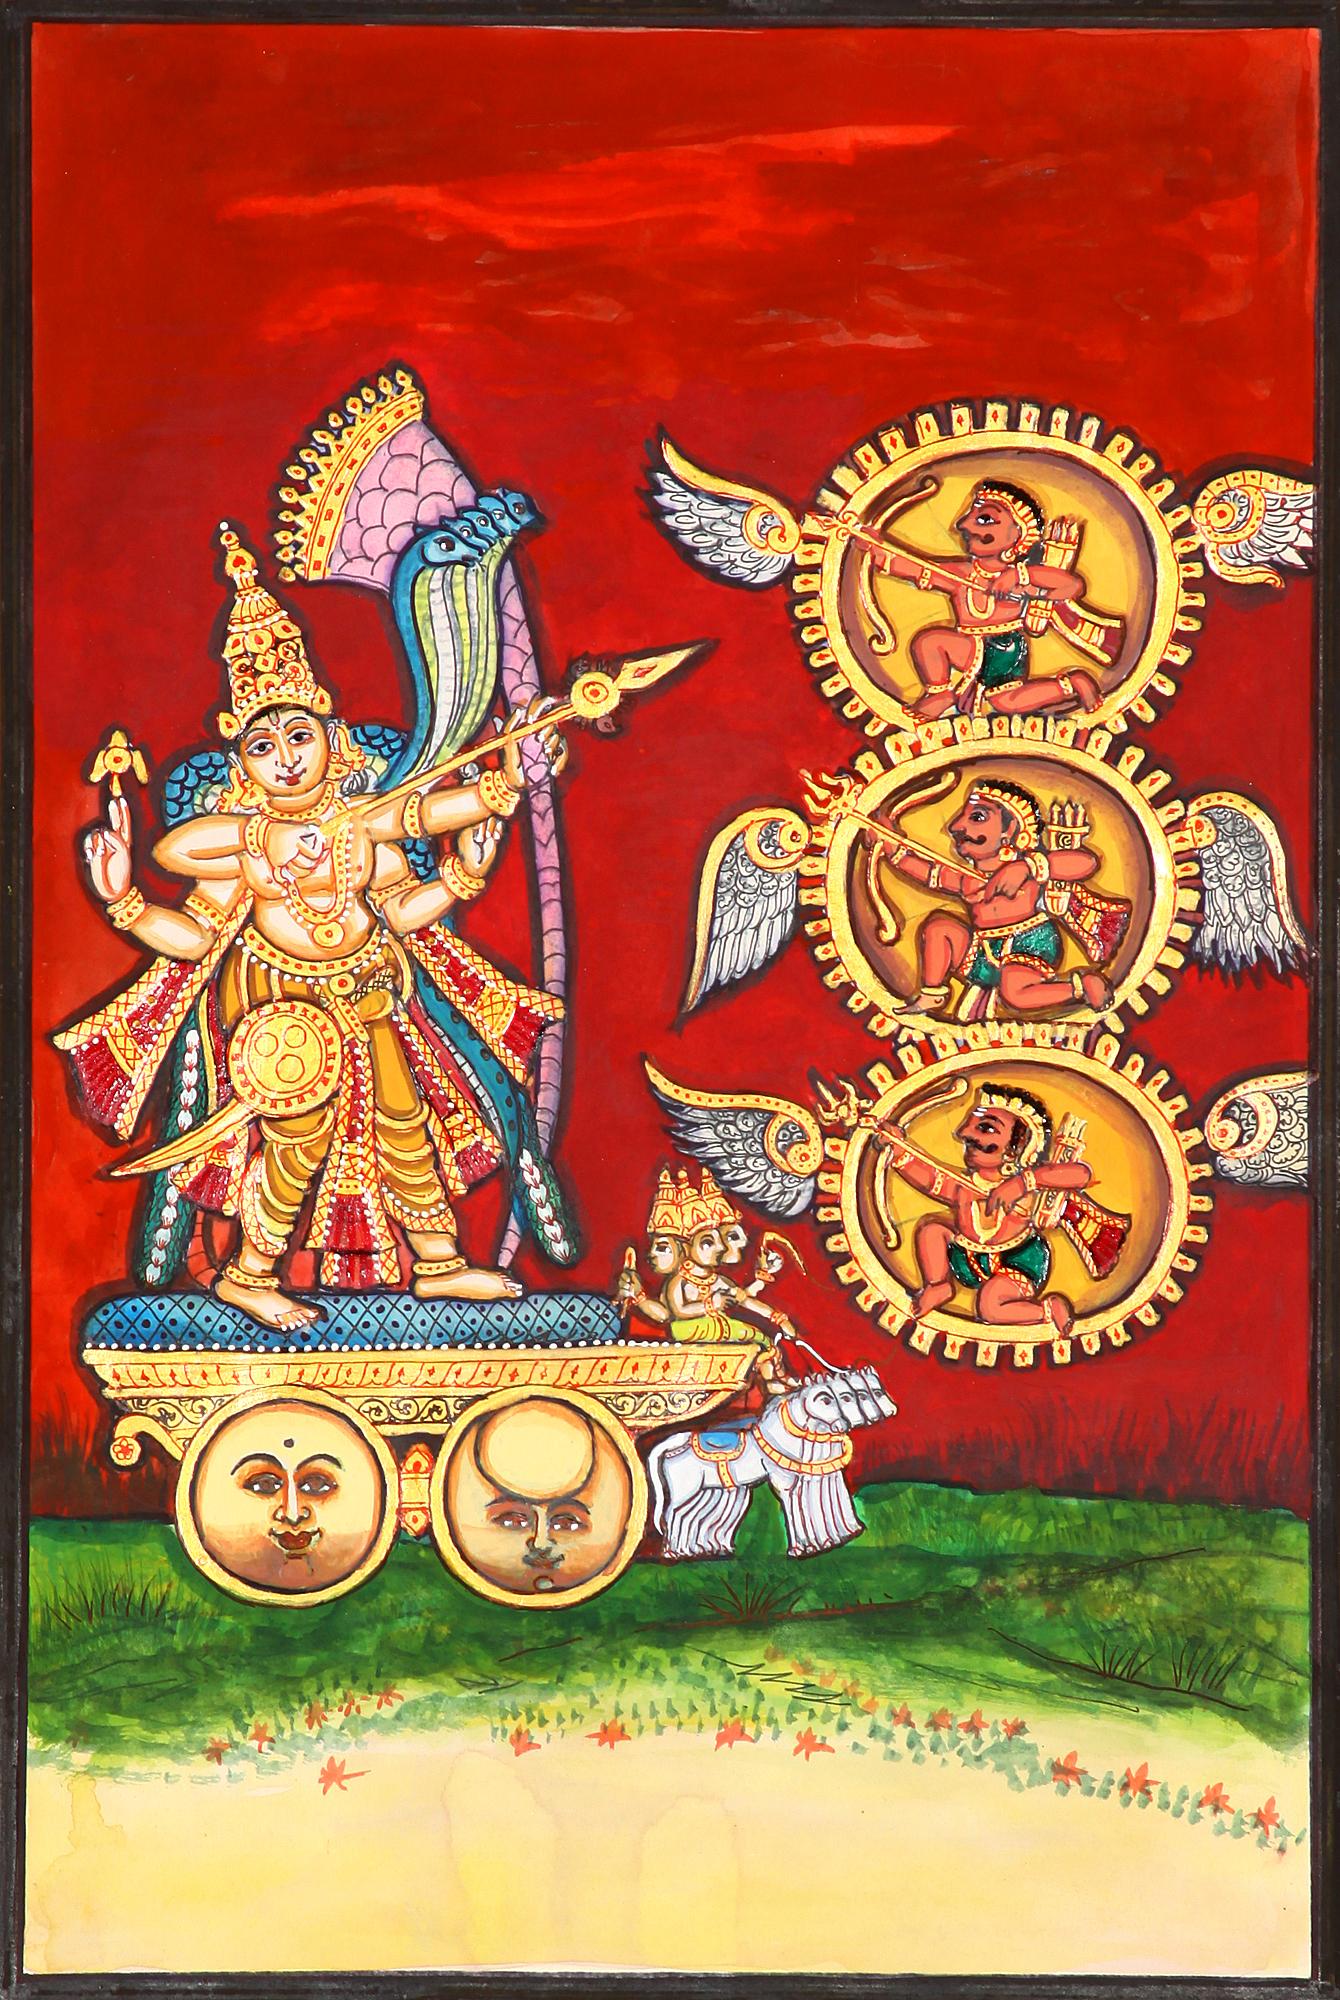 Tripurantaka - Exotic India